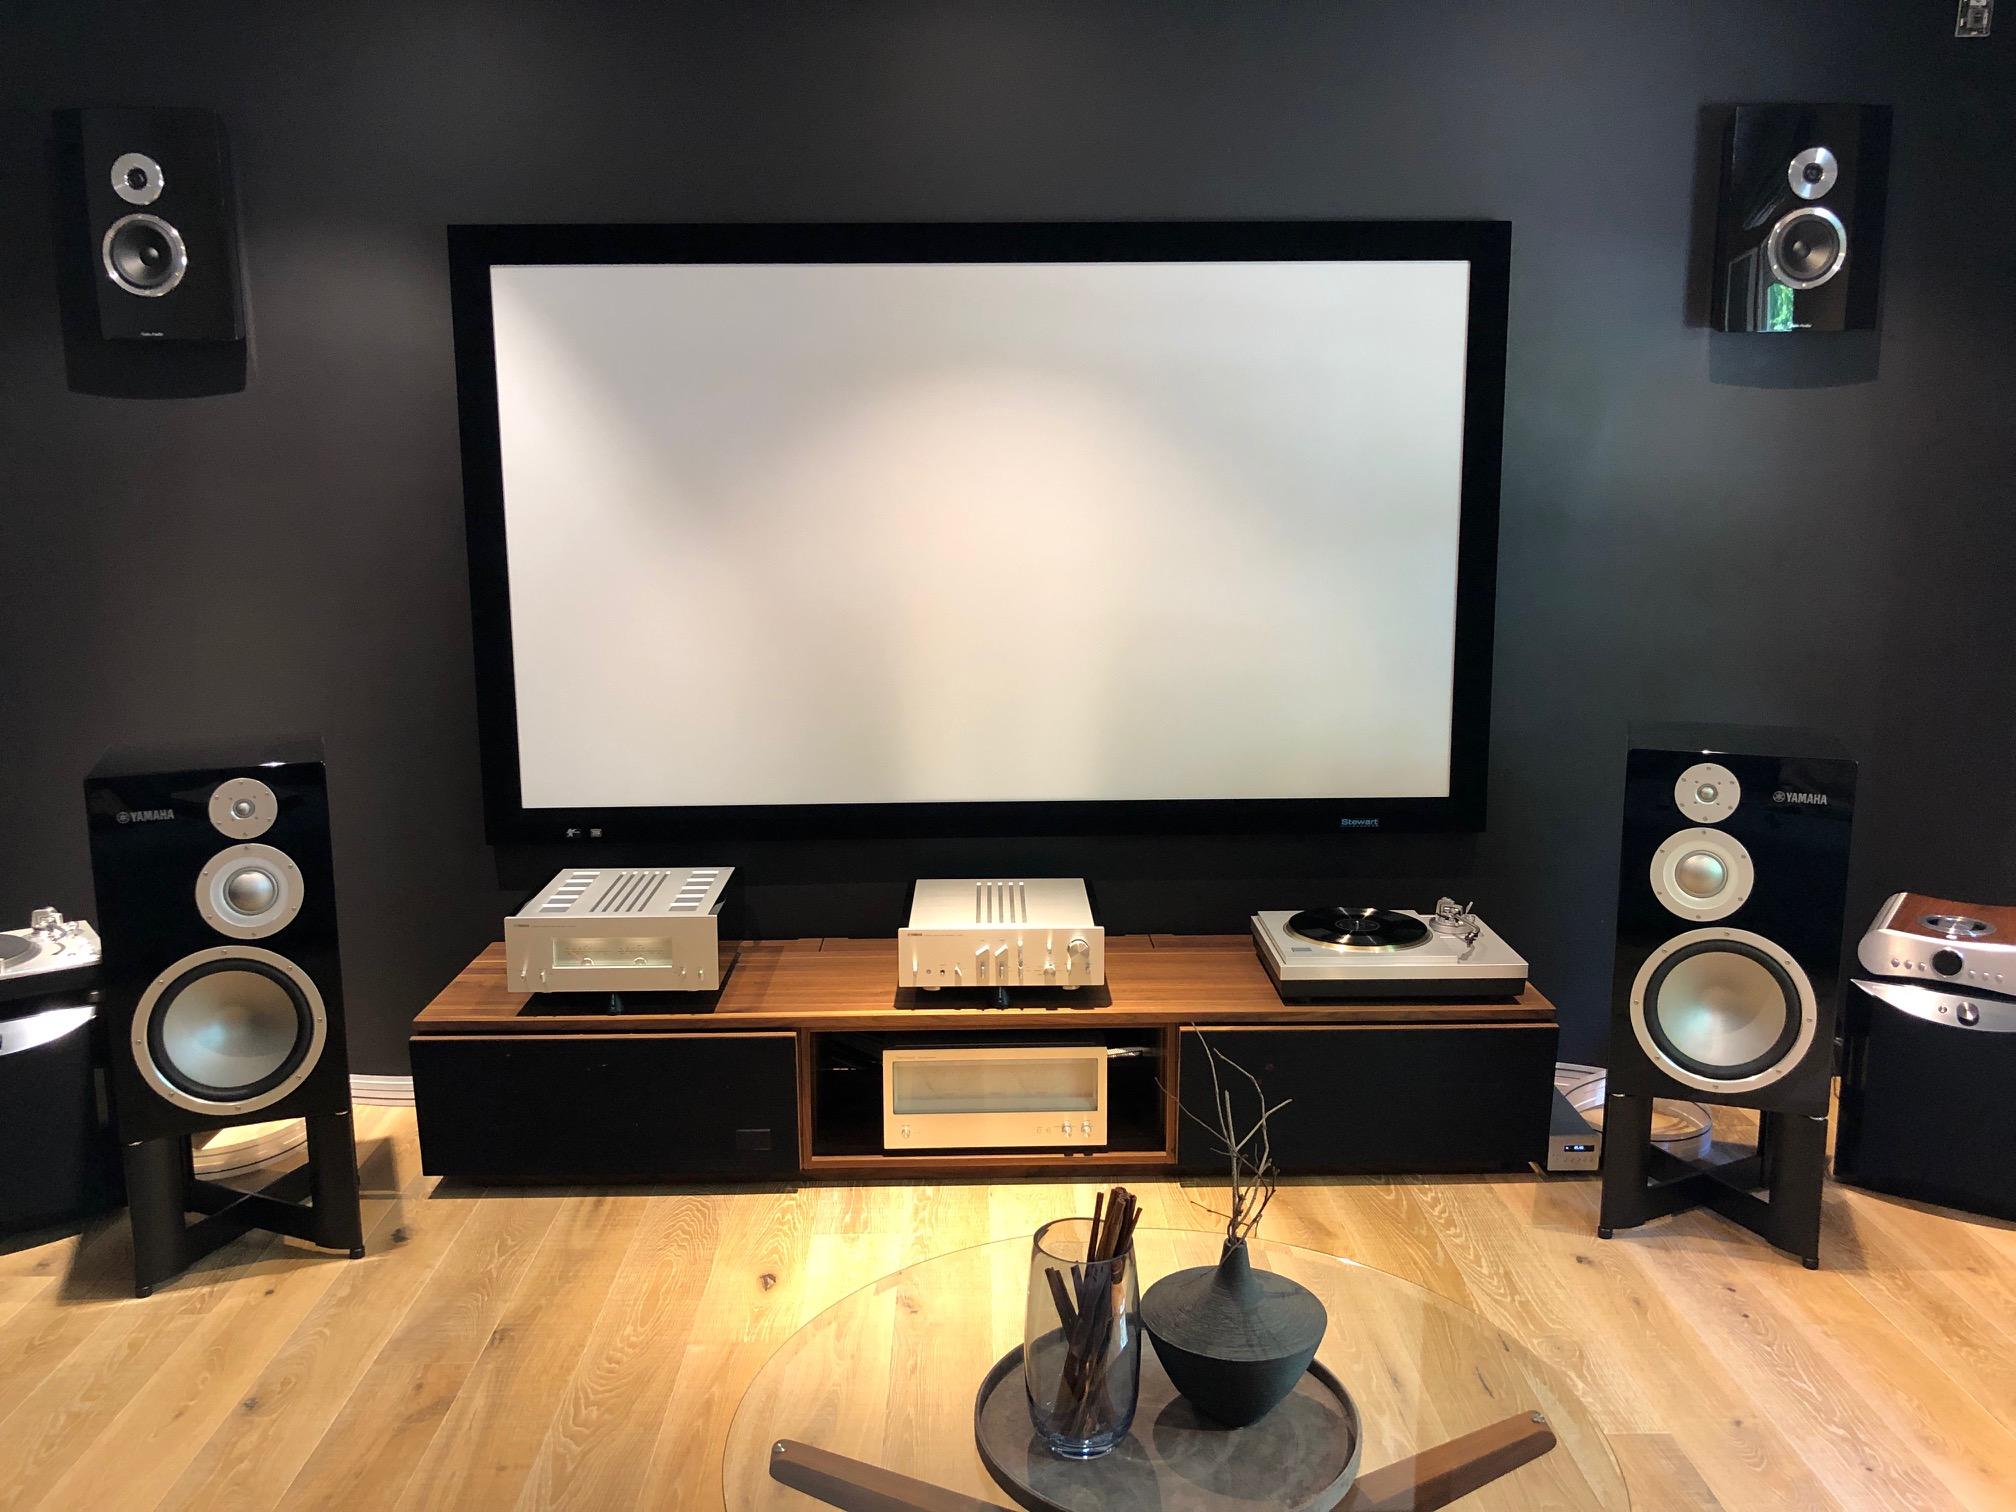 Reference Class Plattenspieler SL - 1000 FLC High-Fidelity Plattenspieler neu definiert - bei Audio Exclusive in Wels